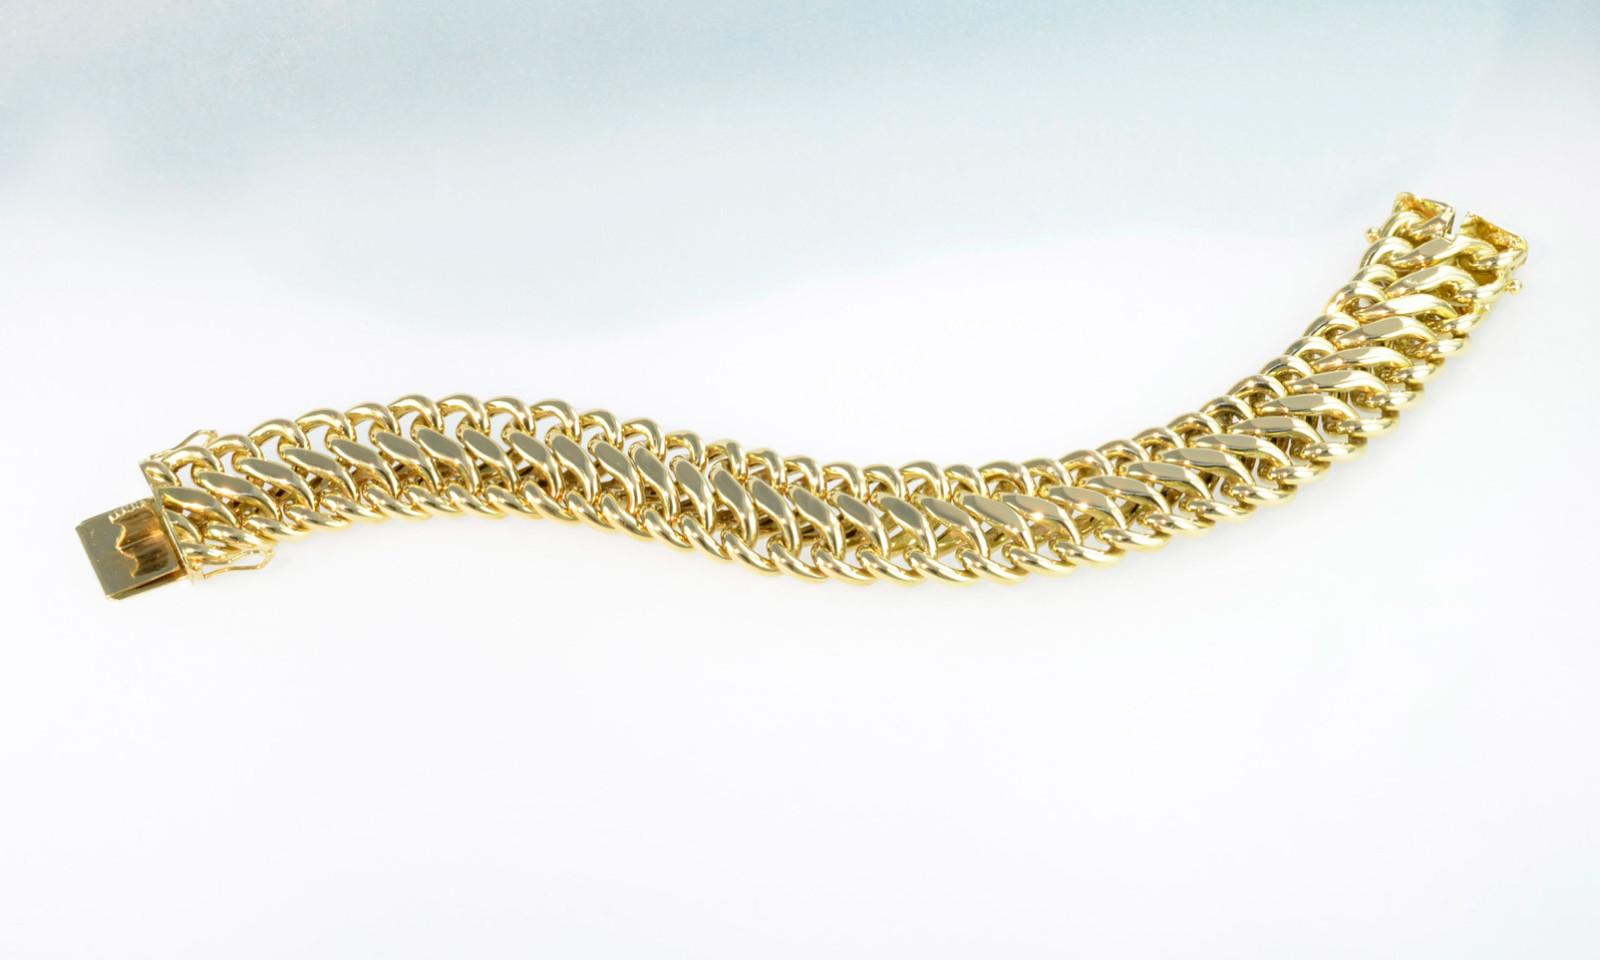 Bracelet Gold. Bracelet Gelbgold 750, 1950-er Jahre, Breite 16 mm, Länge 19 cm,  44.4 gr., CHF 3500.-